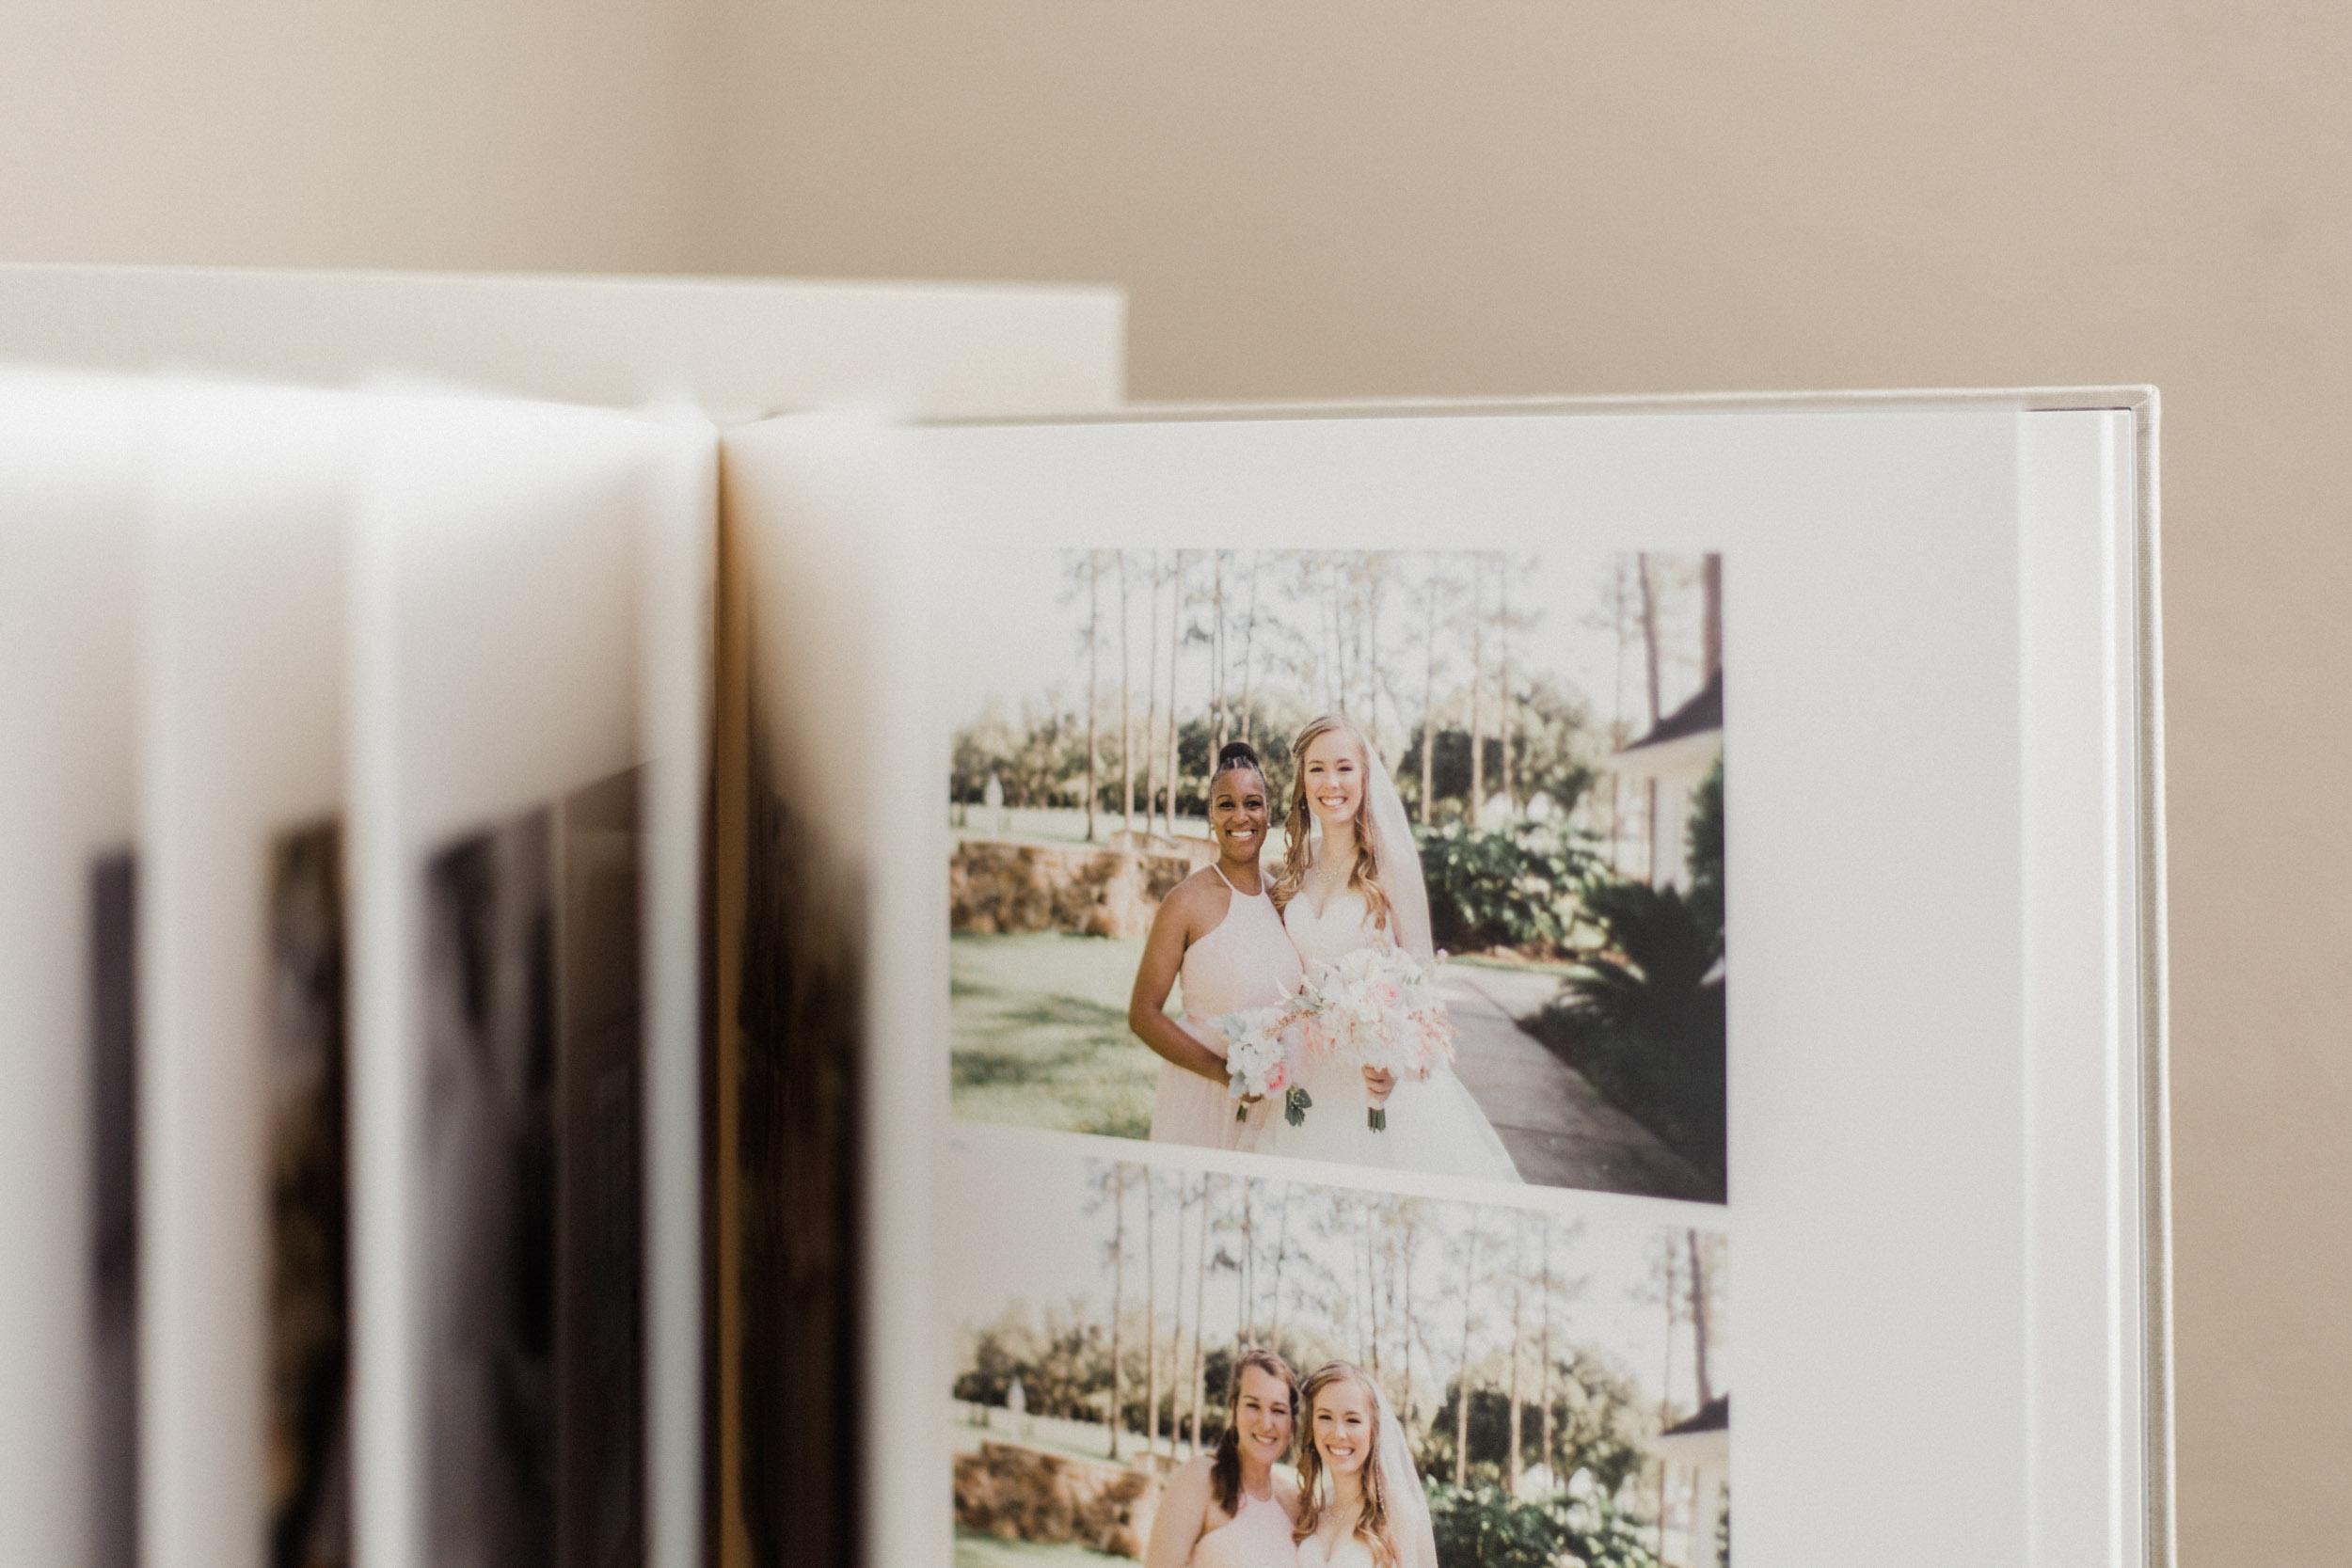 Carography-Studios-St-Augustine-Wedding-Photos-amber-concept-carography-studios-I58A9590.jpg